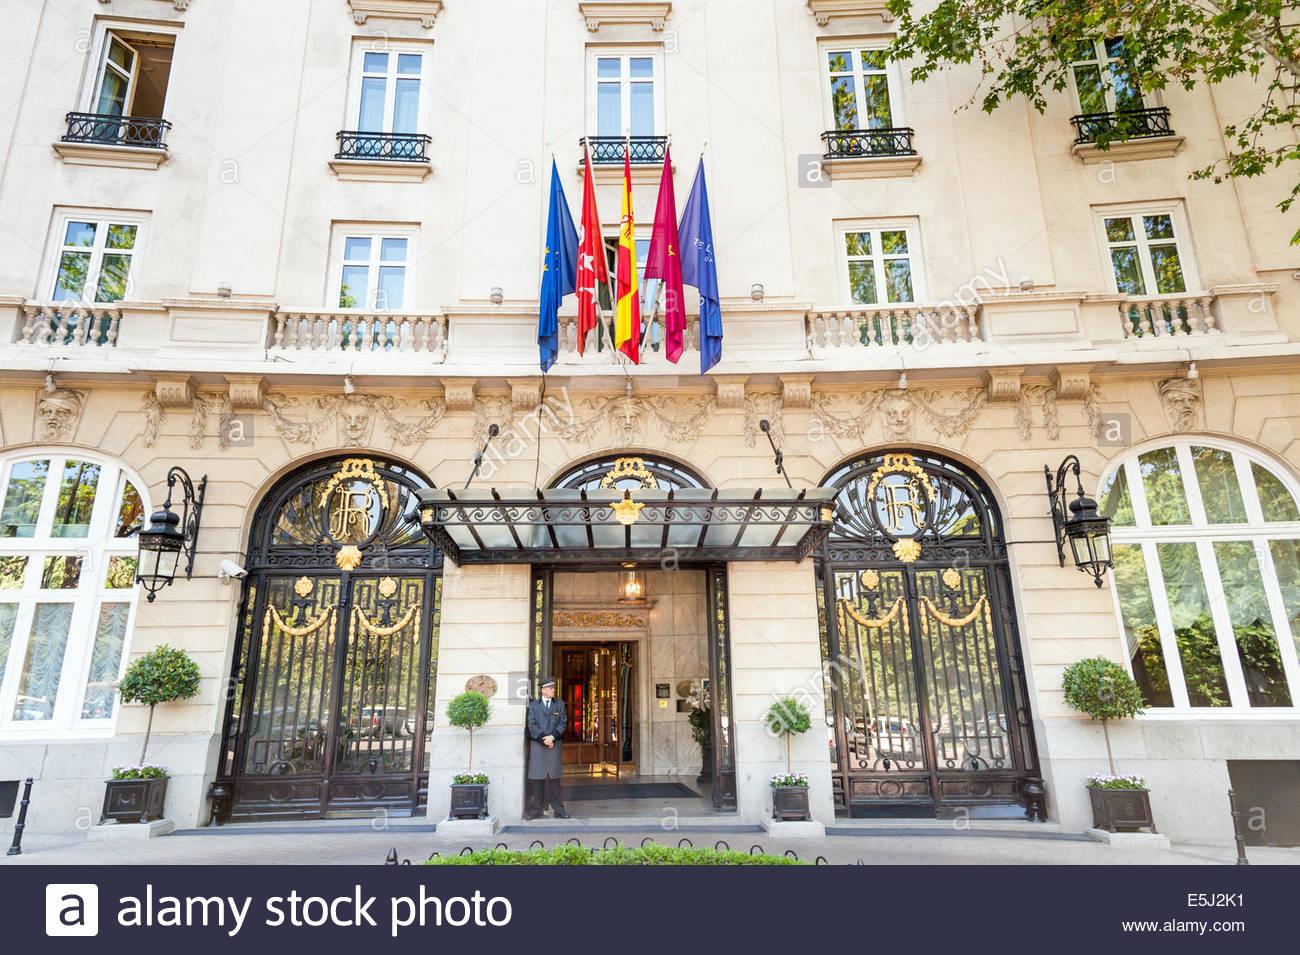 The Ritz Hotel, Madrid, Spain - Stock Image